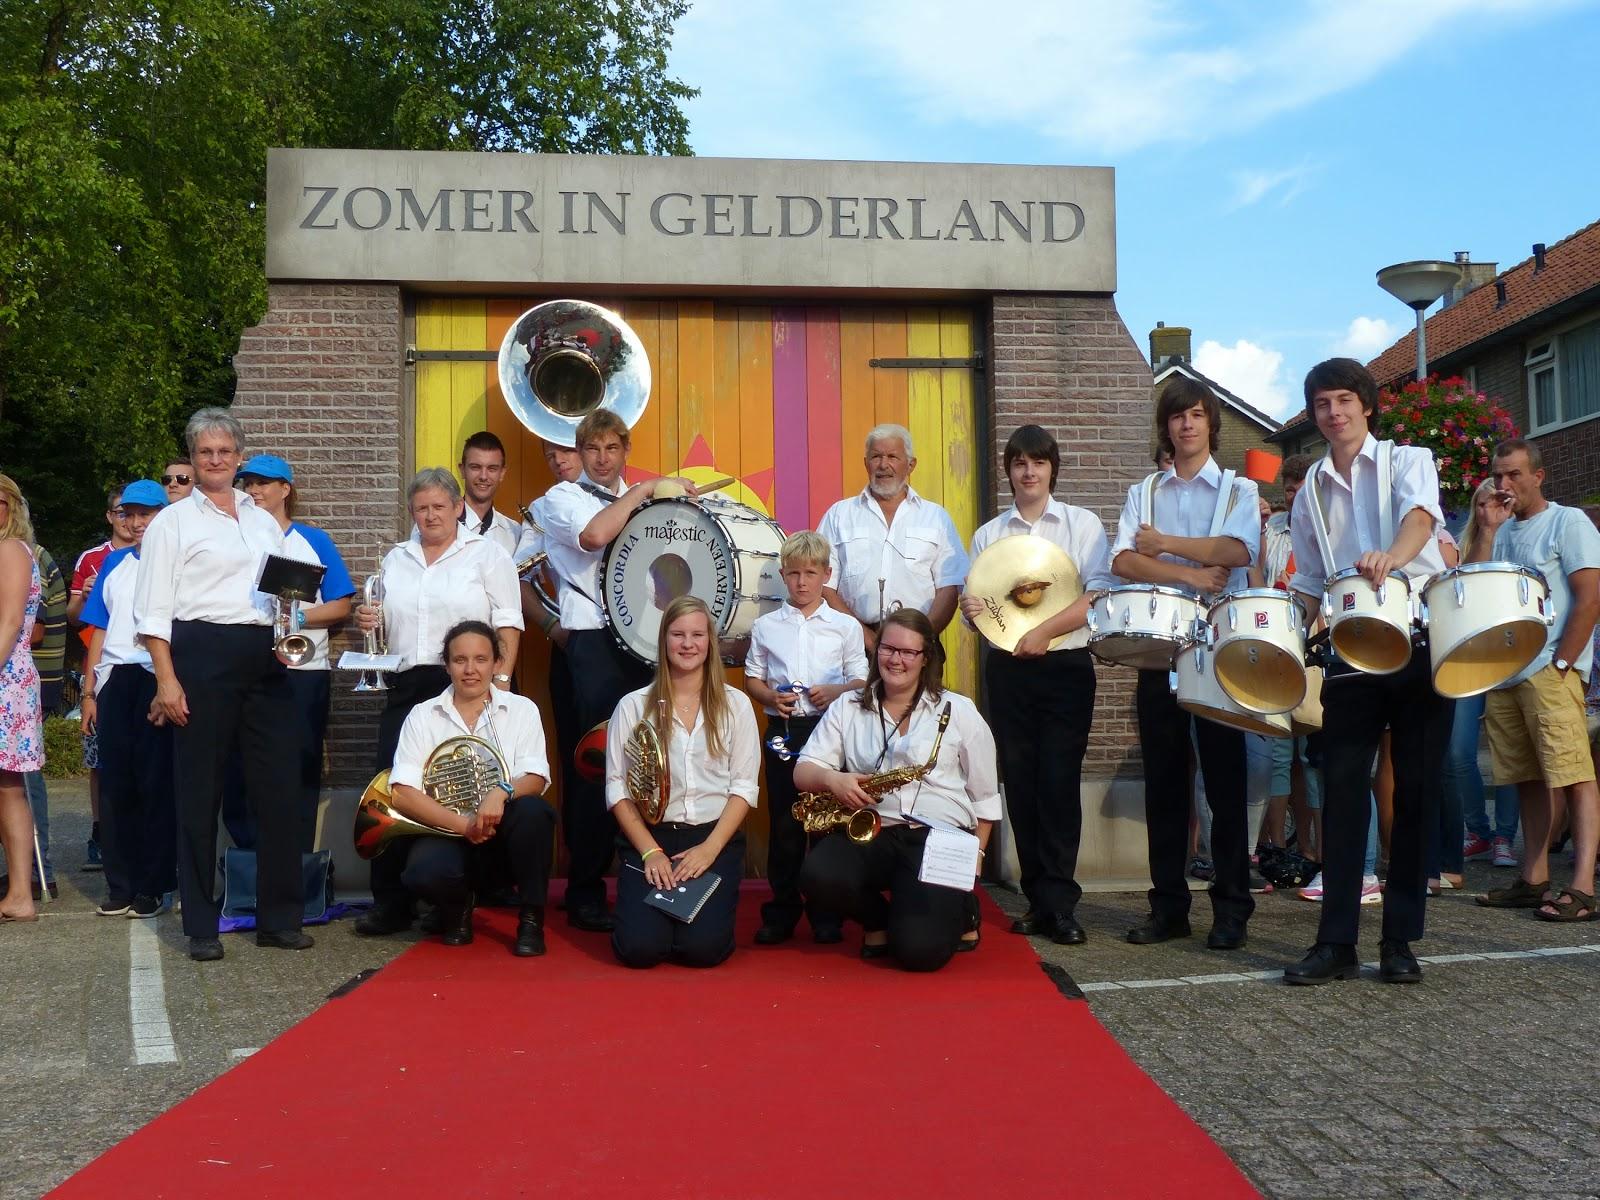 Concordia - Album 2014-08 - Zomer in Gelderland